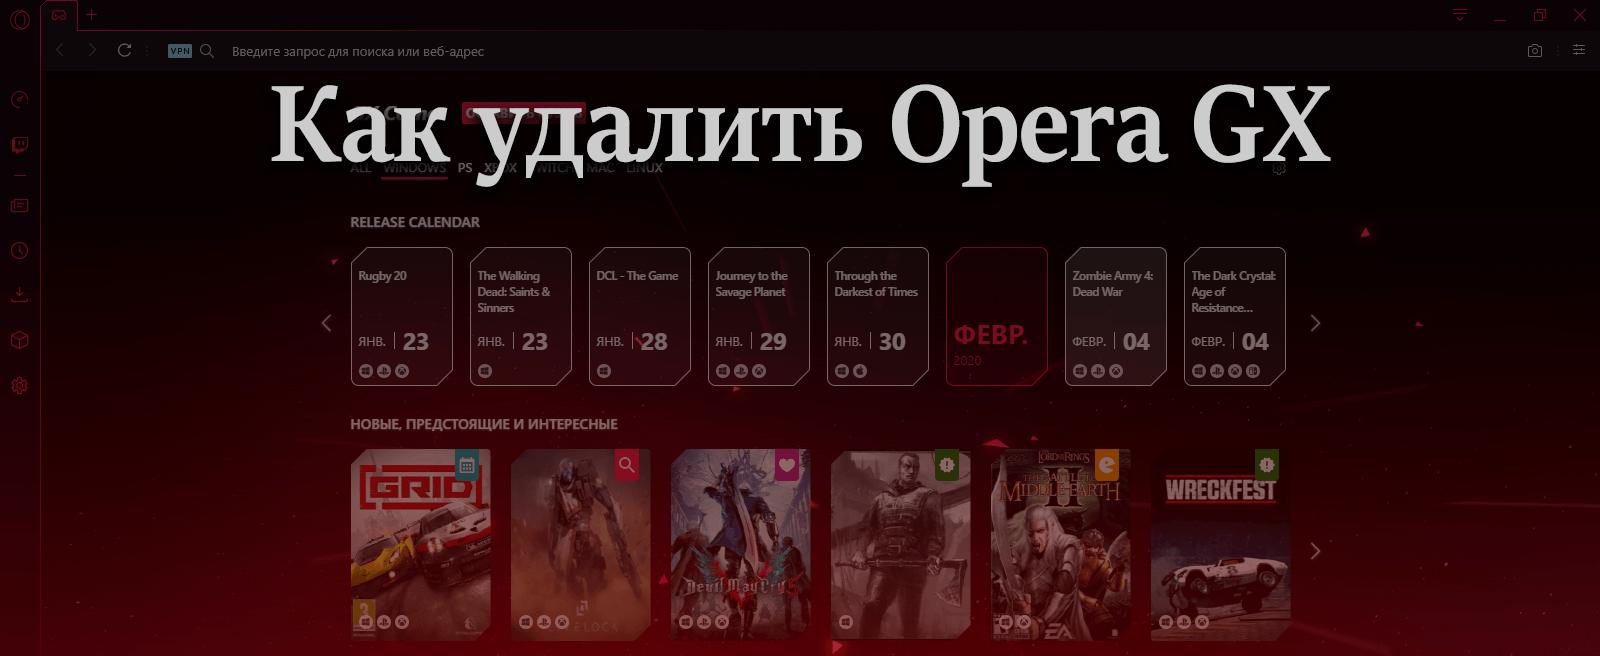 Как удалить Opera GX